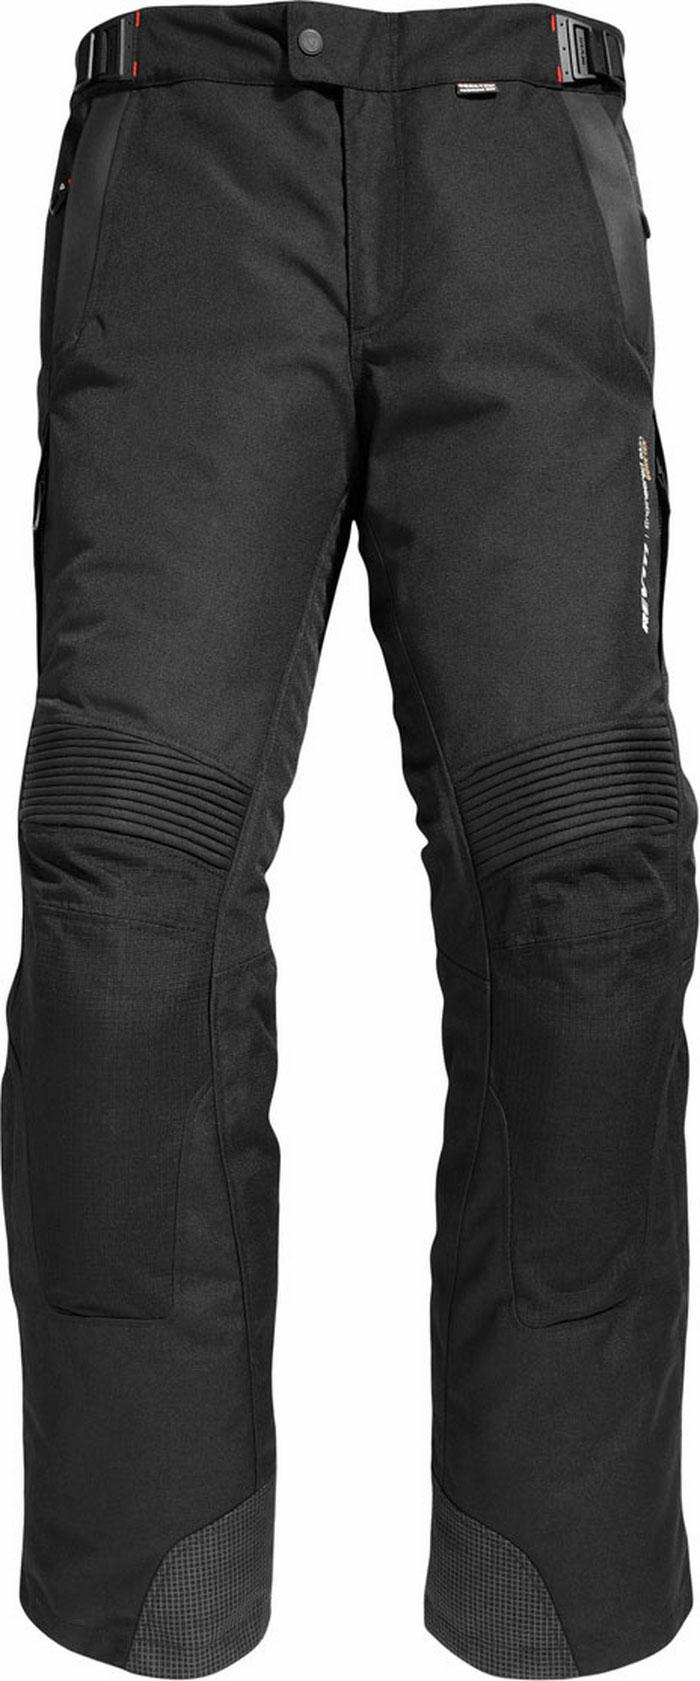 Pantaloni moto Rev'it Legacy GTX - Allungato